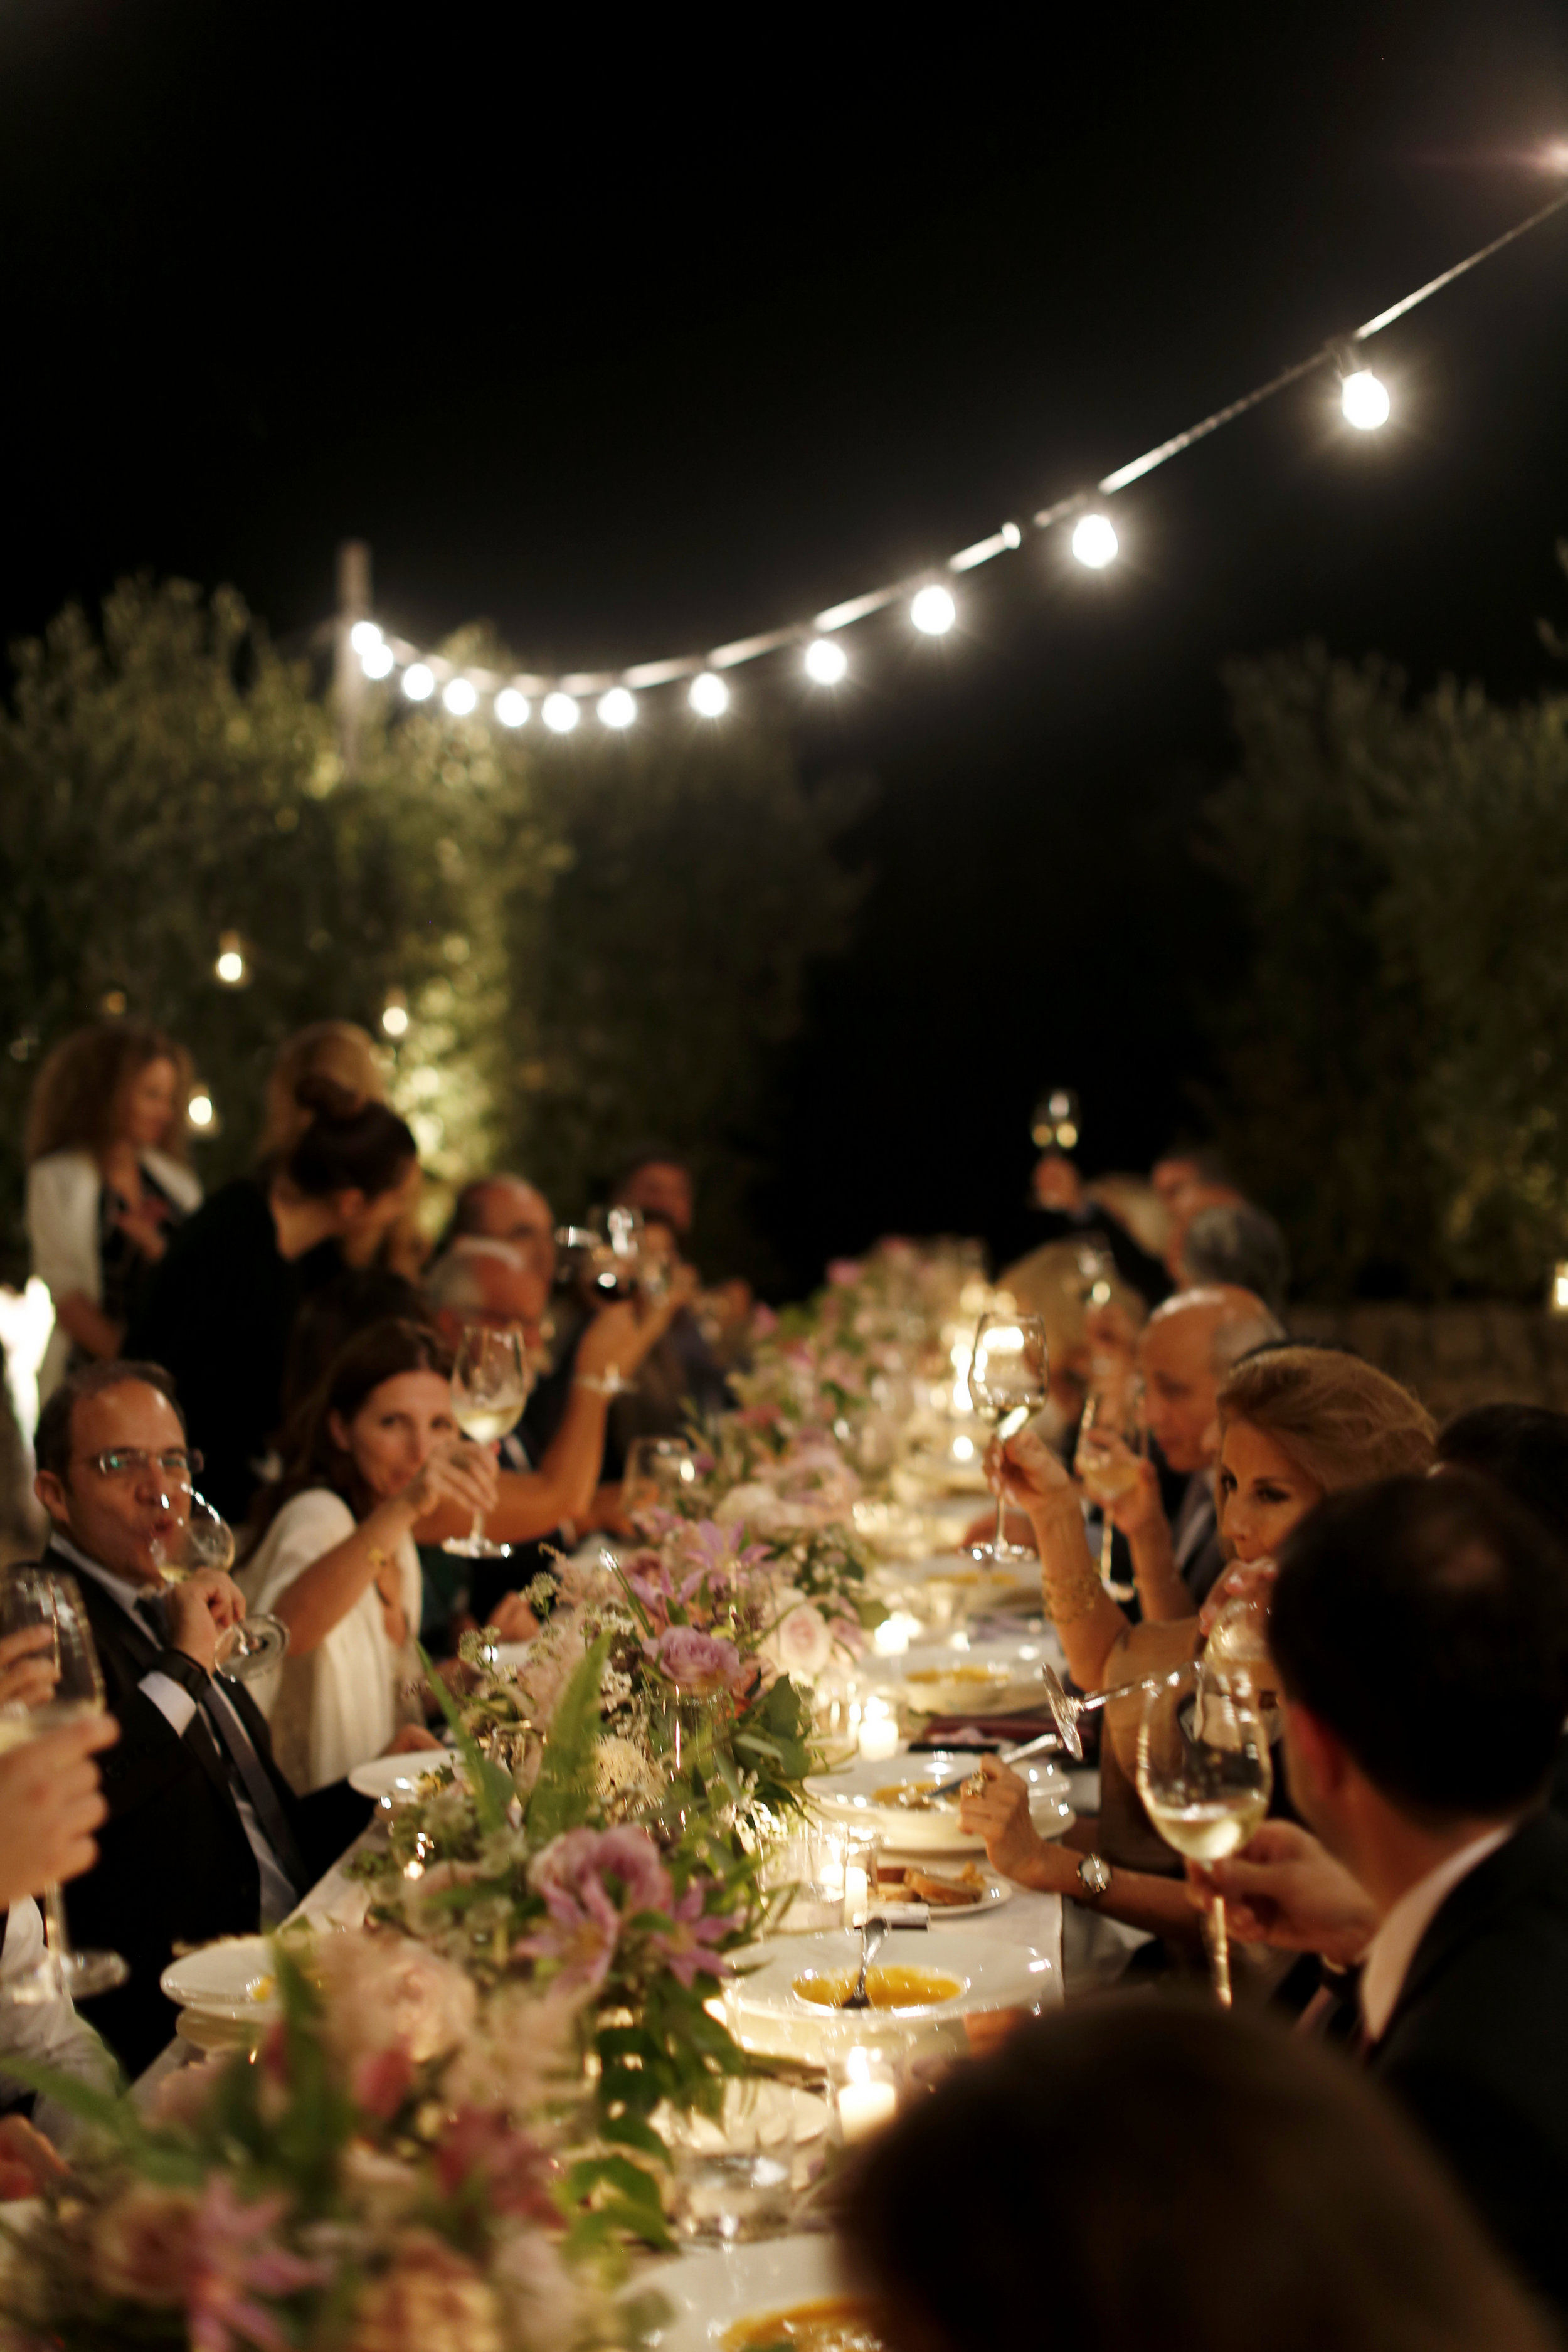 borgo egnazia wedding italy alison bryan 17